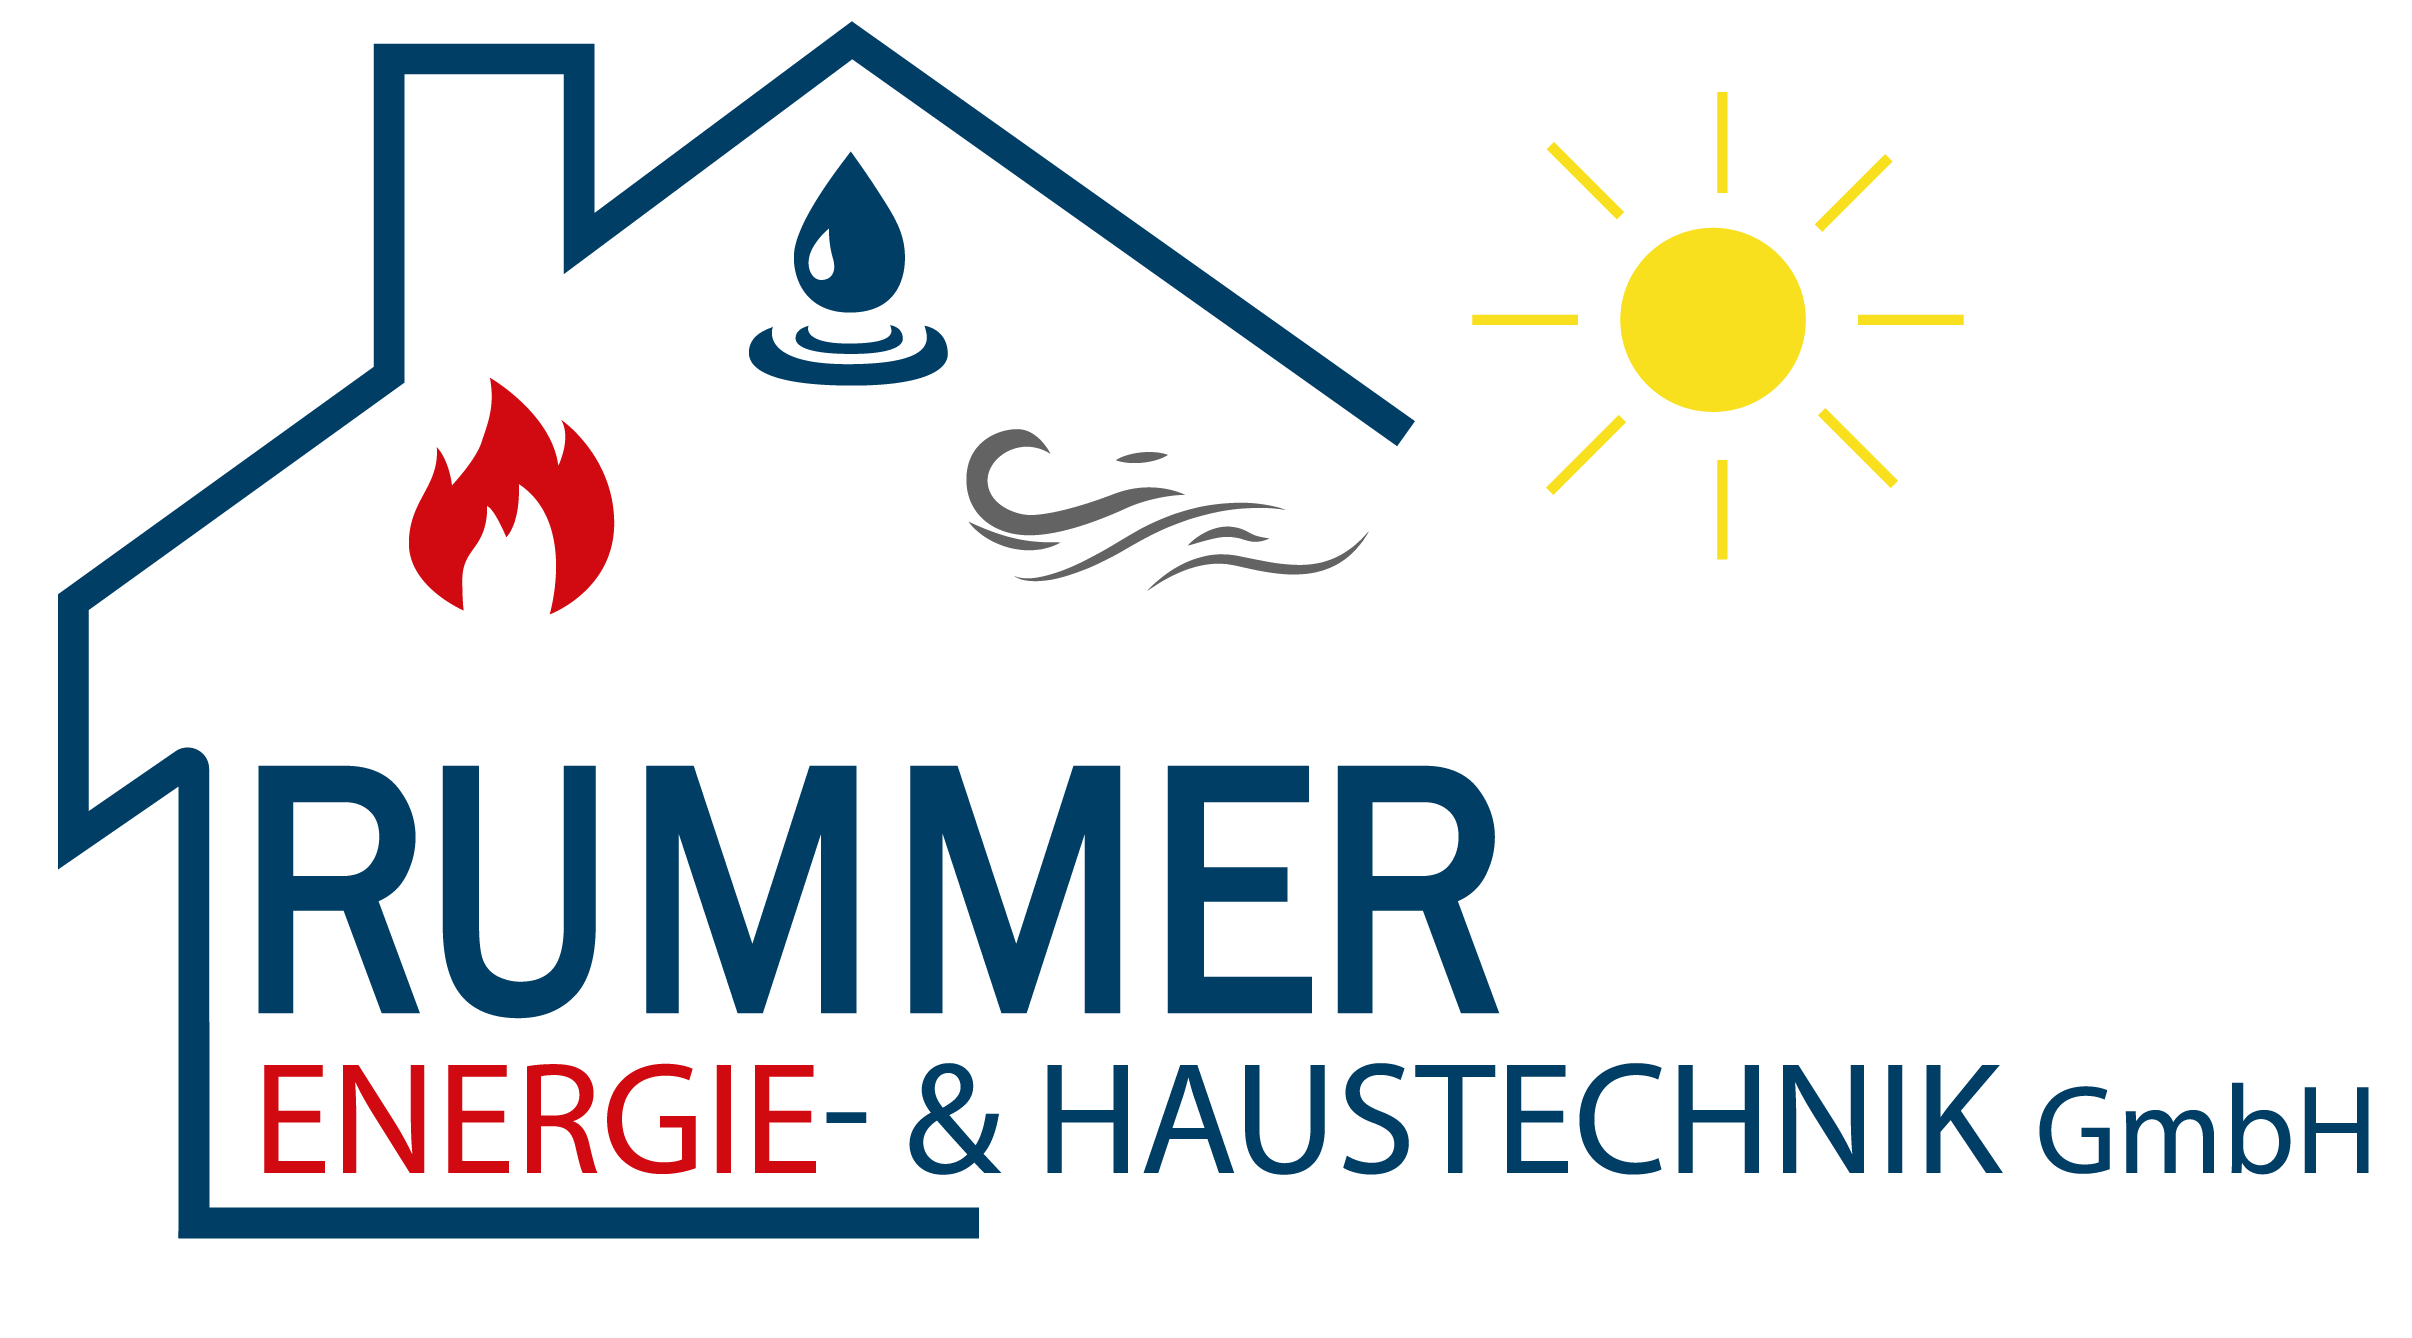 Rummer Energie- & Haustechnik GmbH